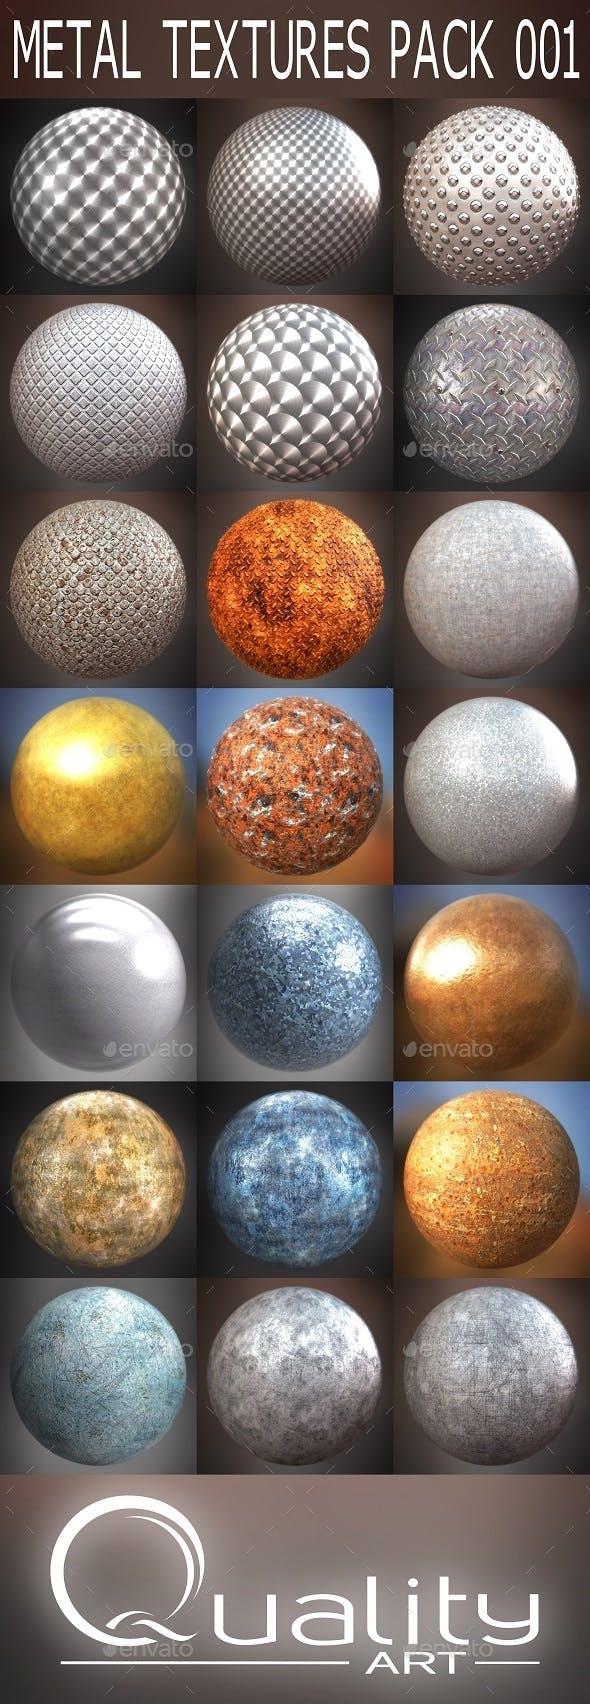 Metal Textures Pack 001 - 3DOcean Item for Sale